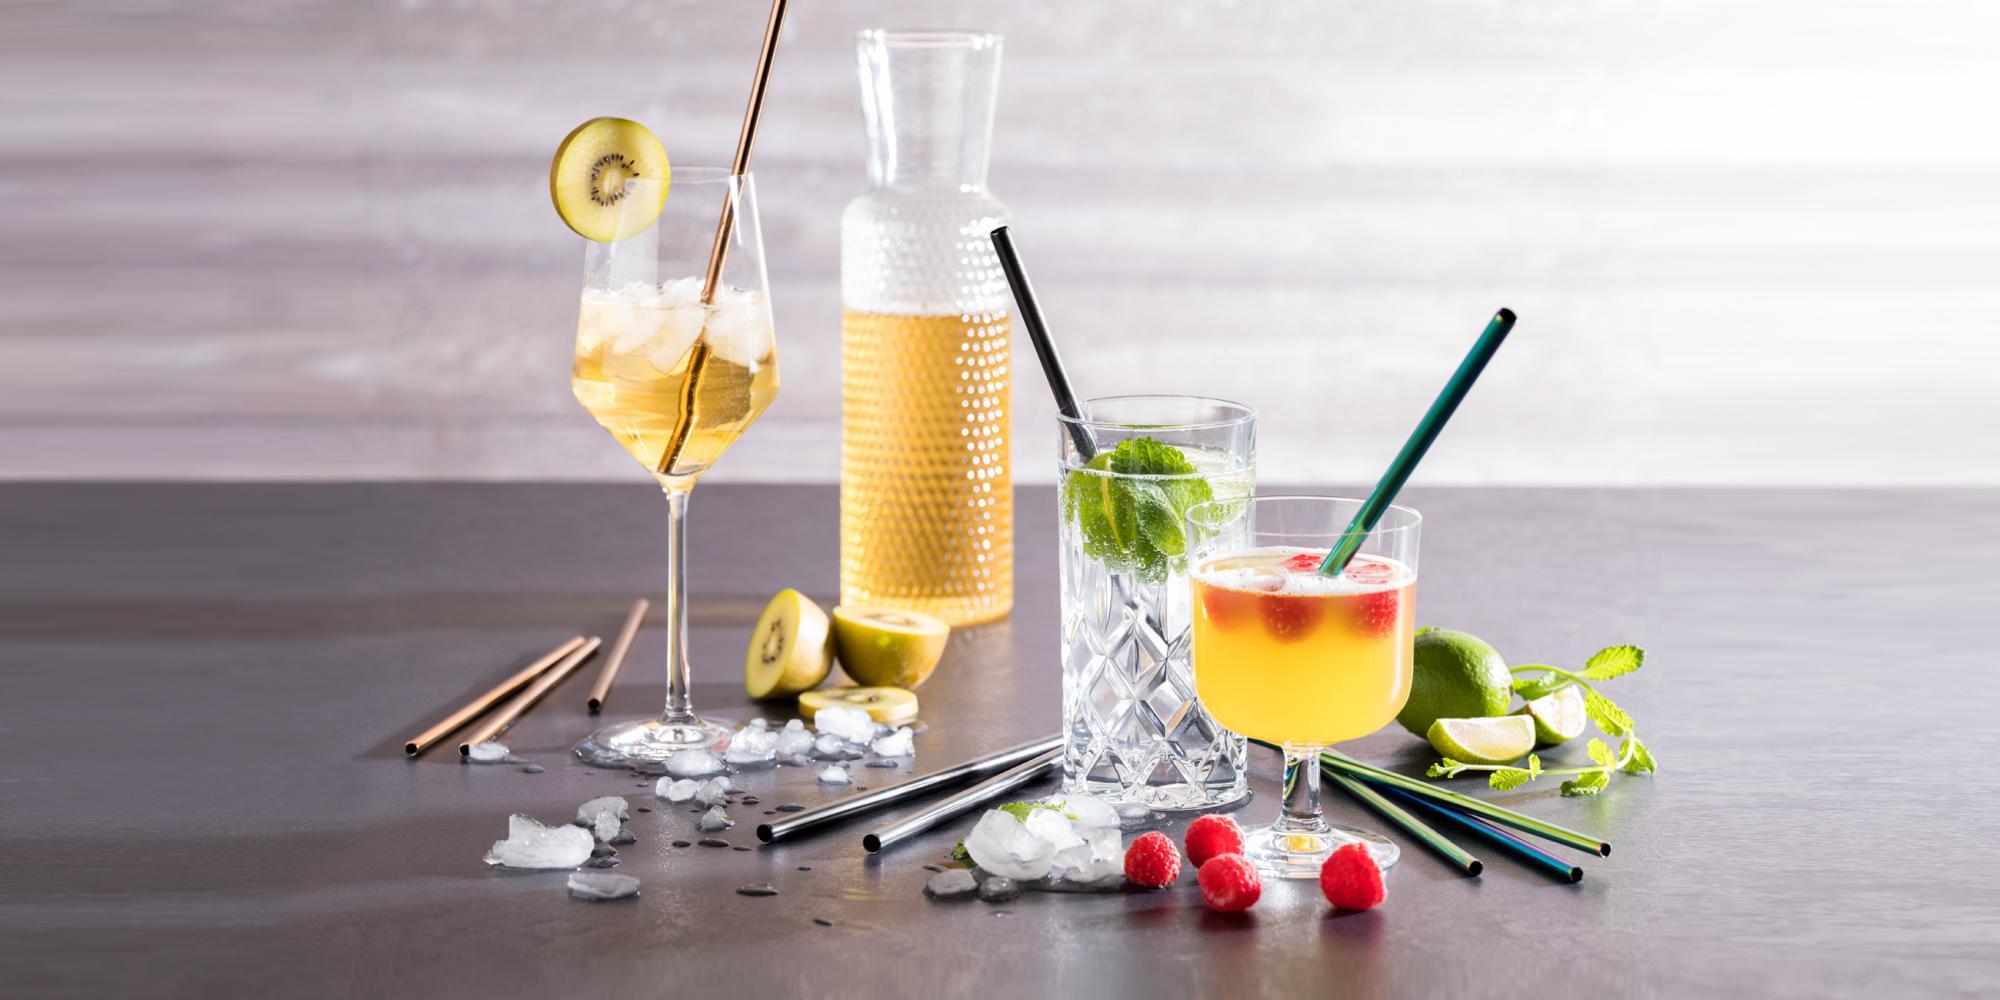 Bar, Café & Drinkware